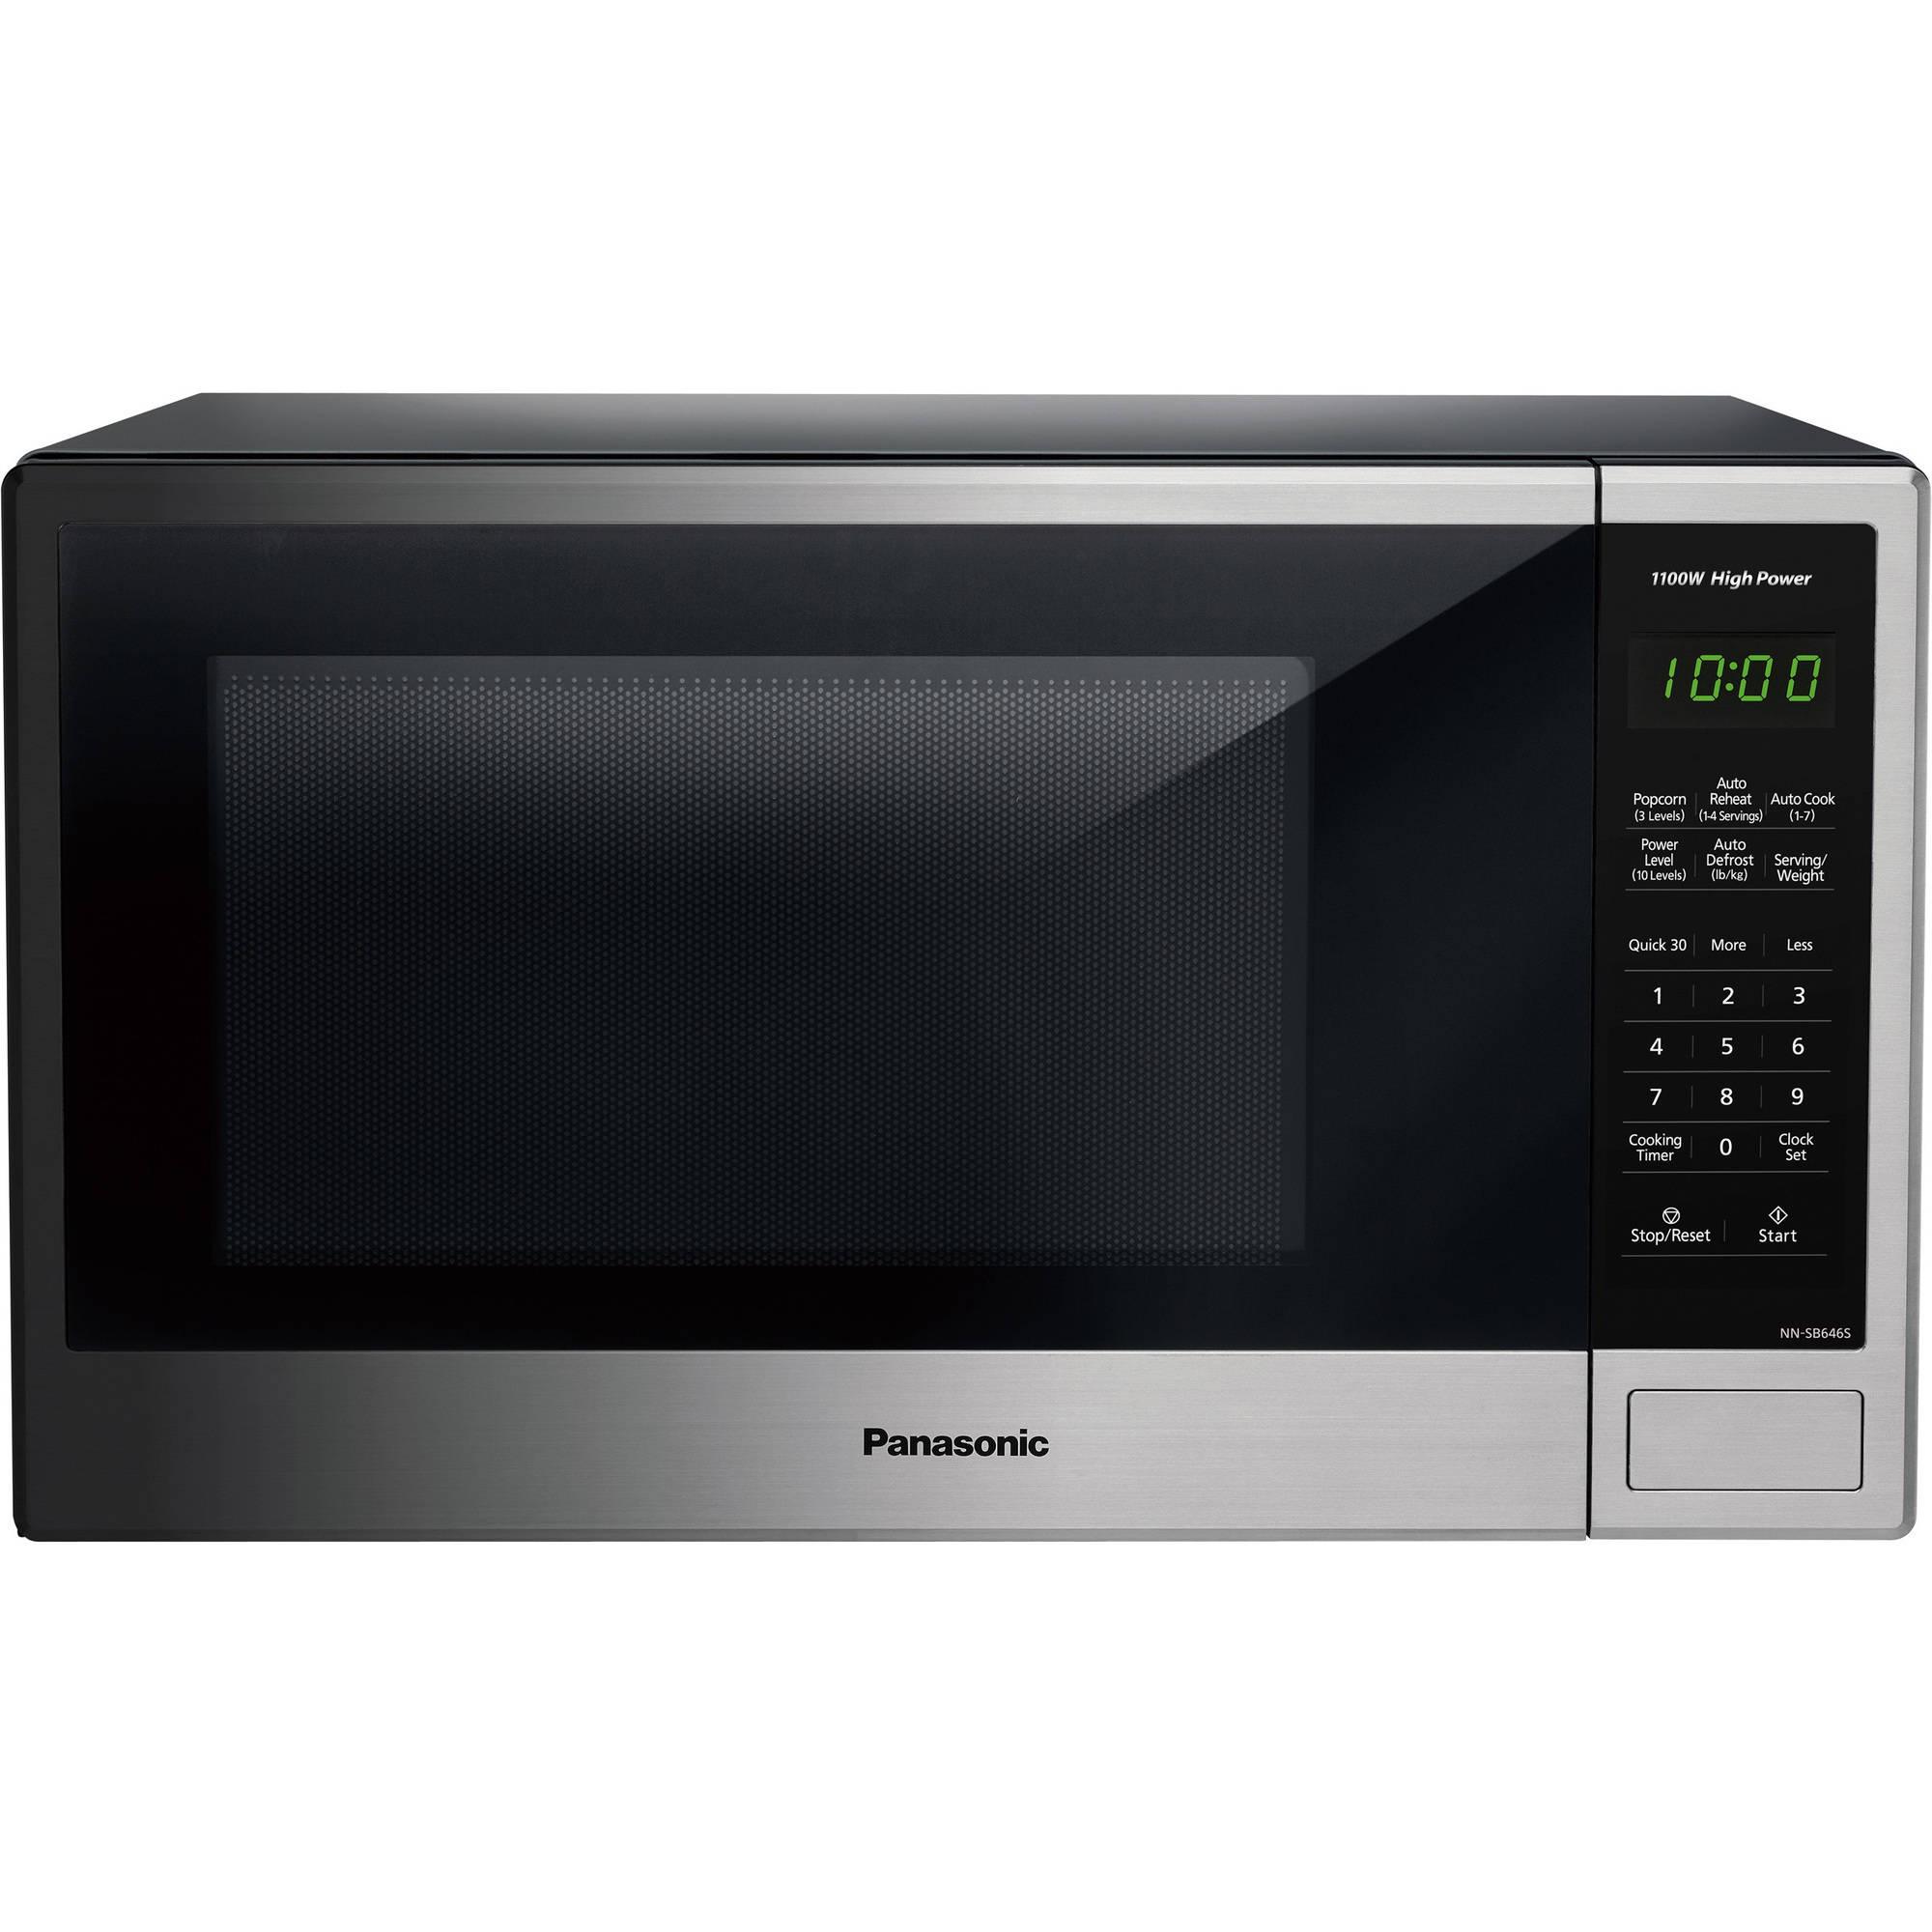 Panasonic 1 3 Cu Ft Microwave Oven Stainless Walmart Com